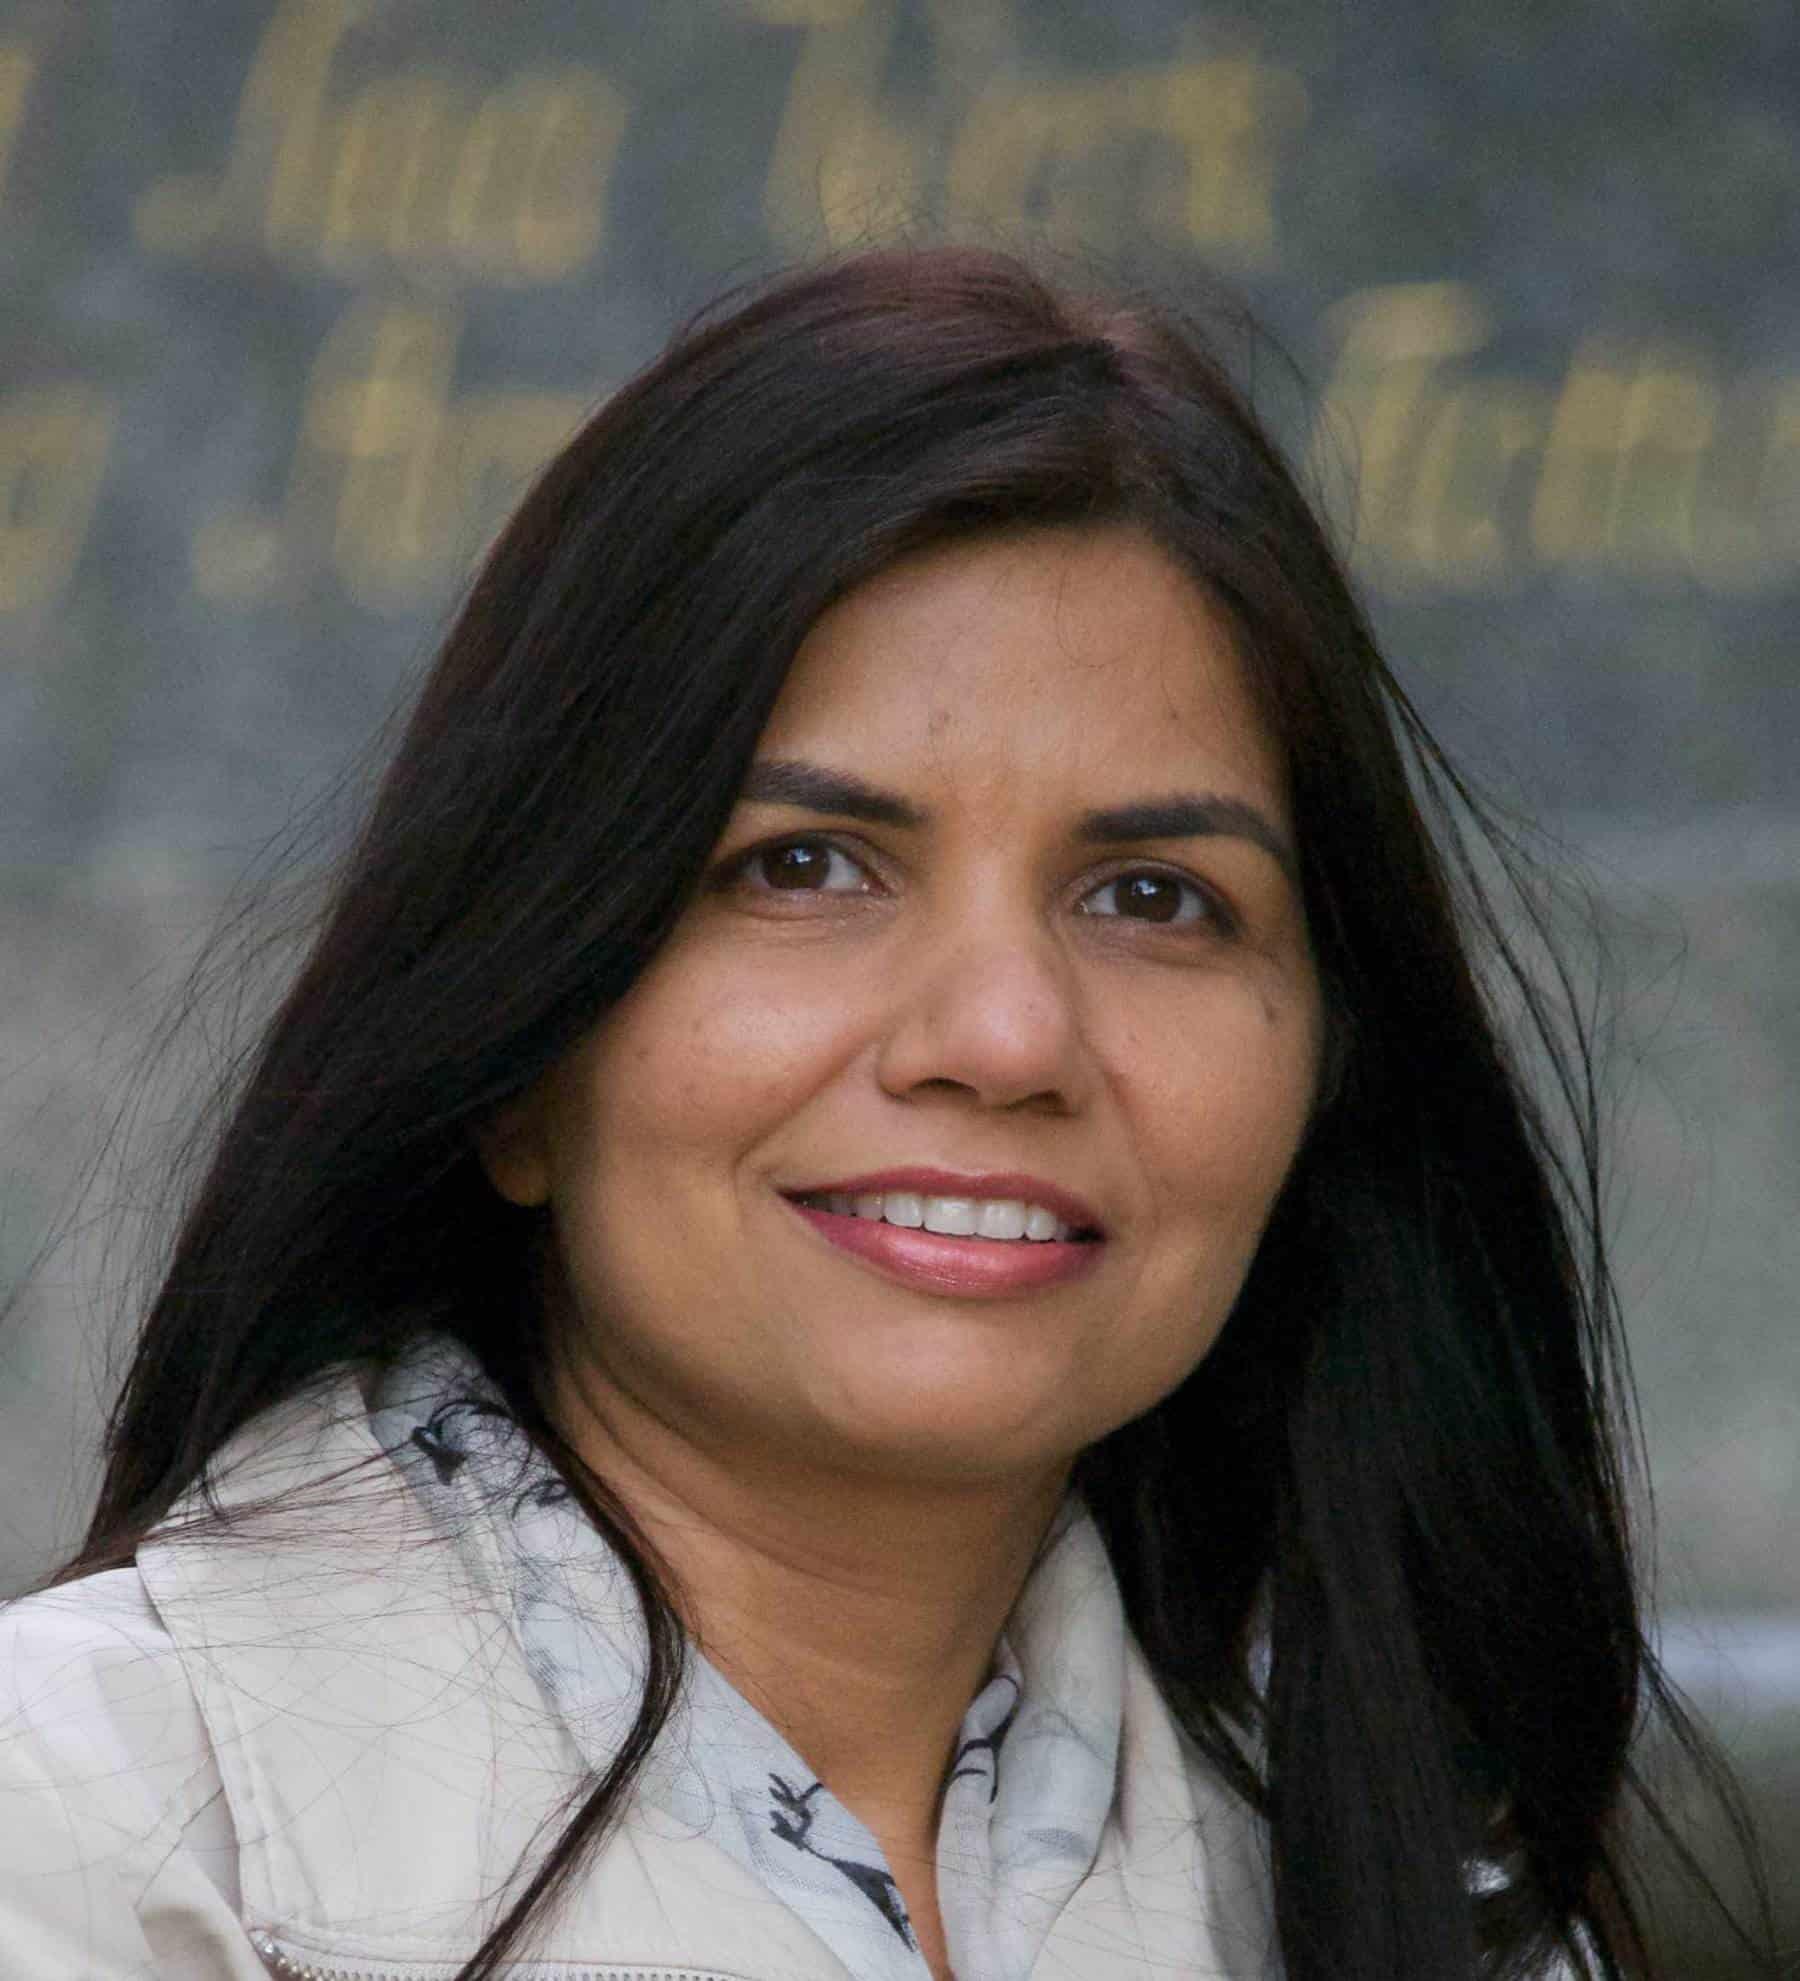 Meenakshi Choudhary